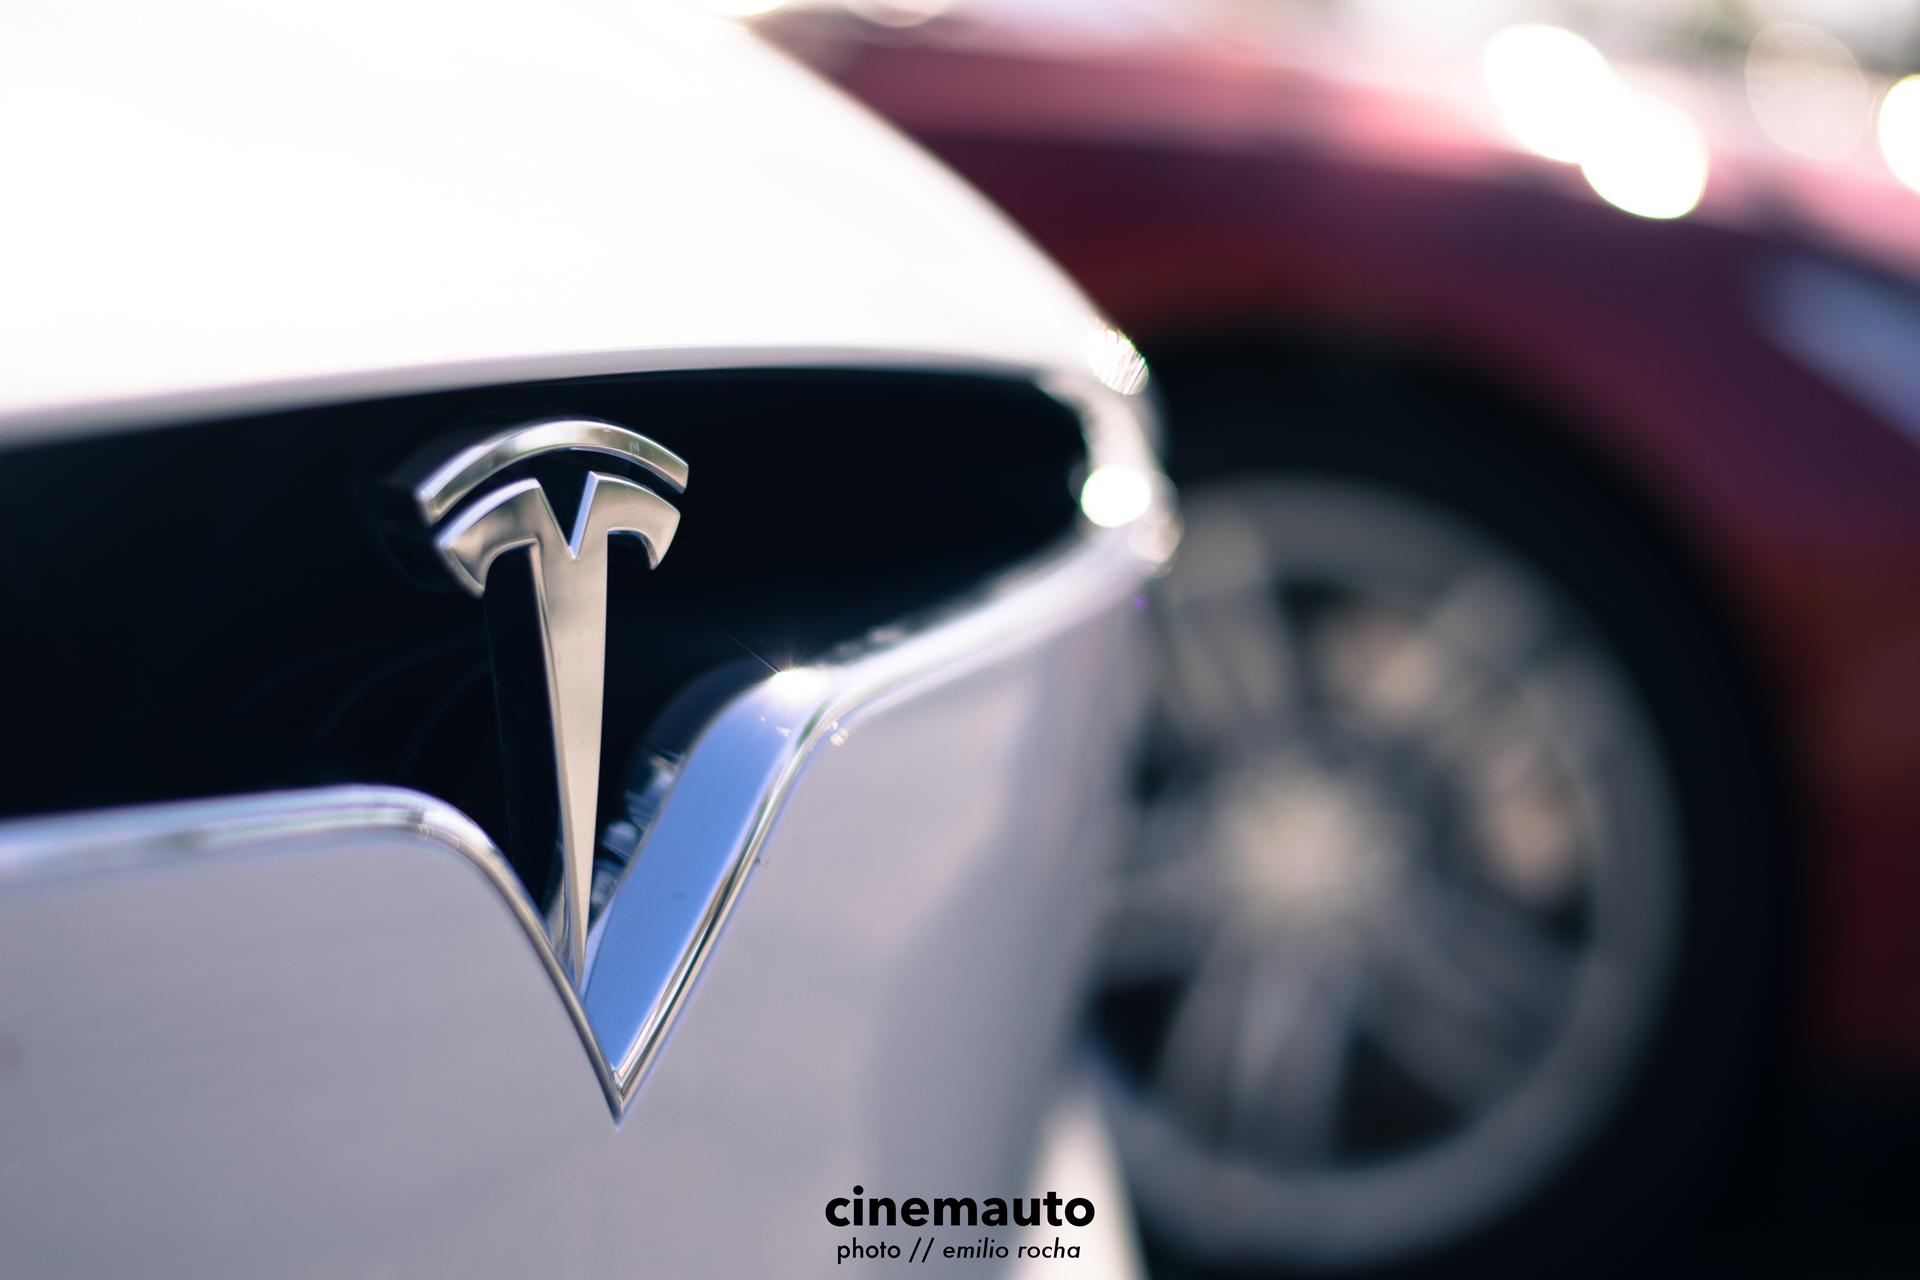 TeslaCinemauto-14.jpg